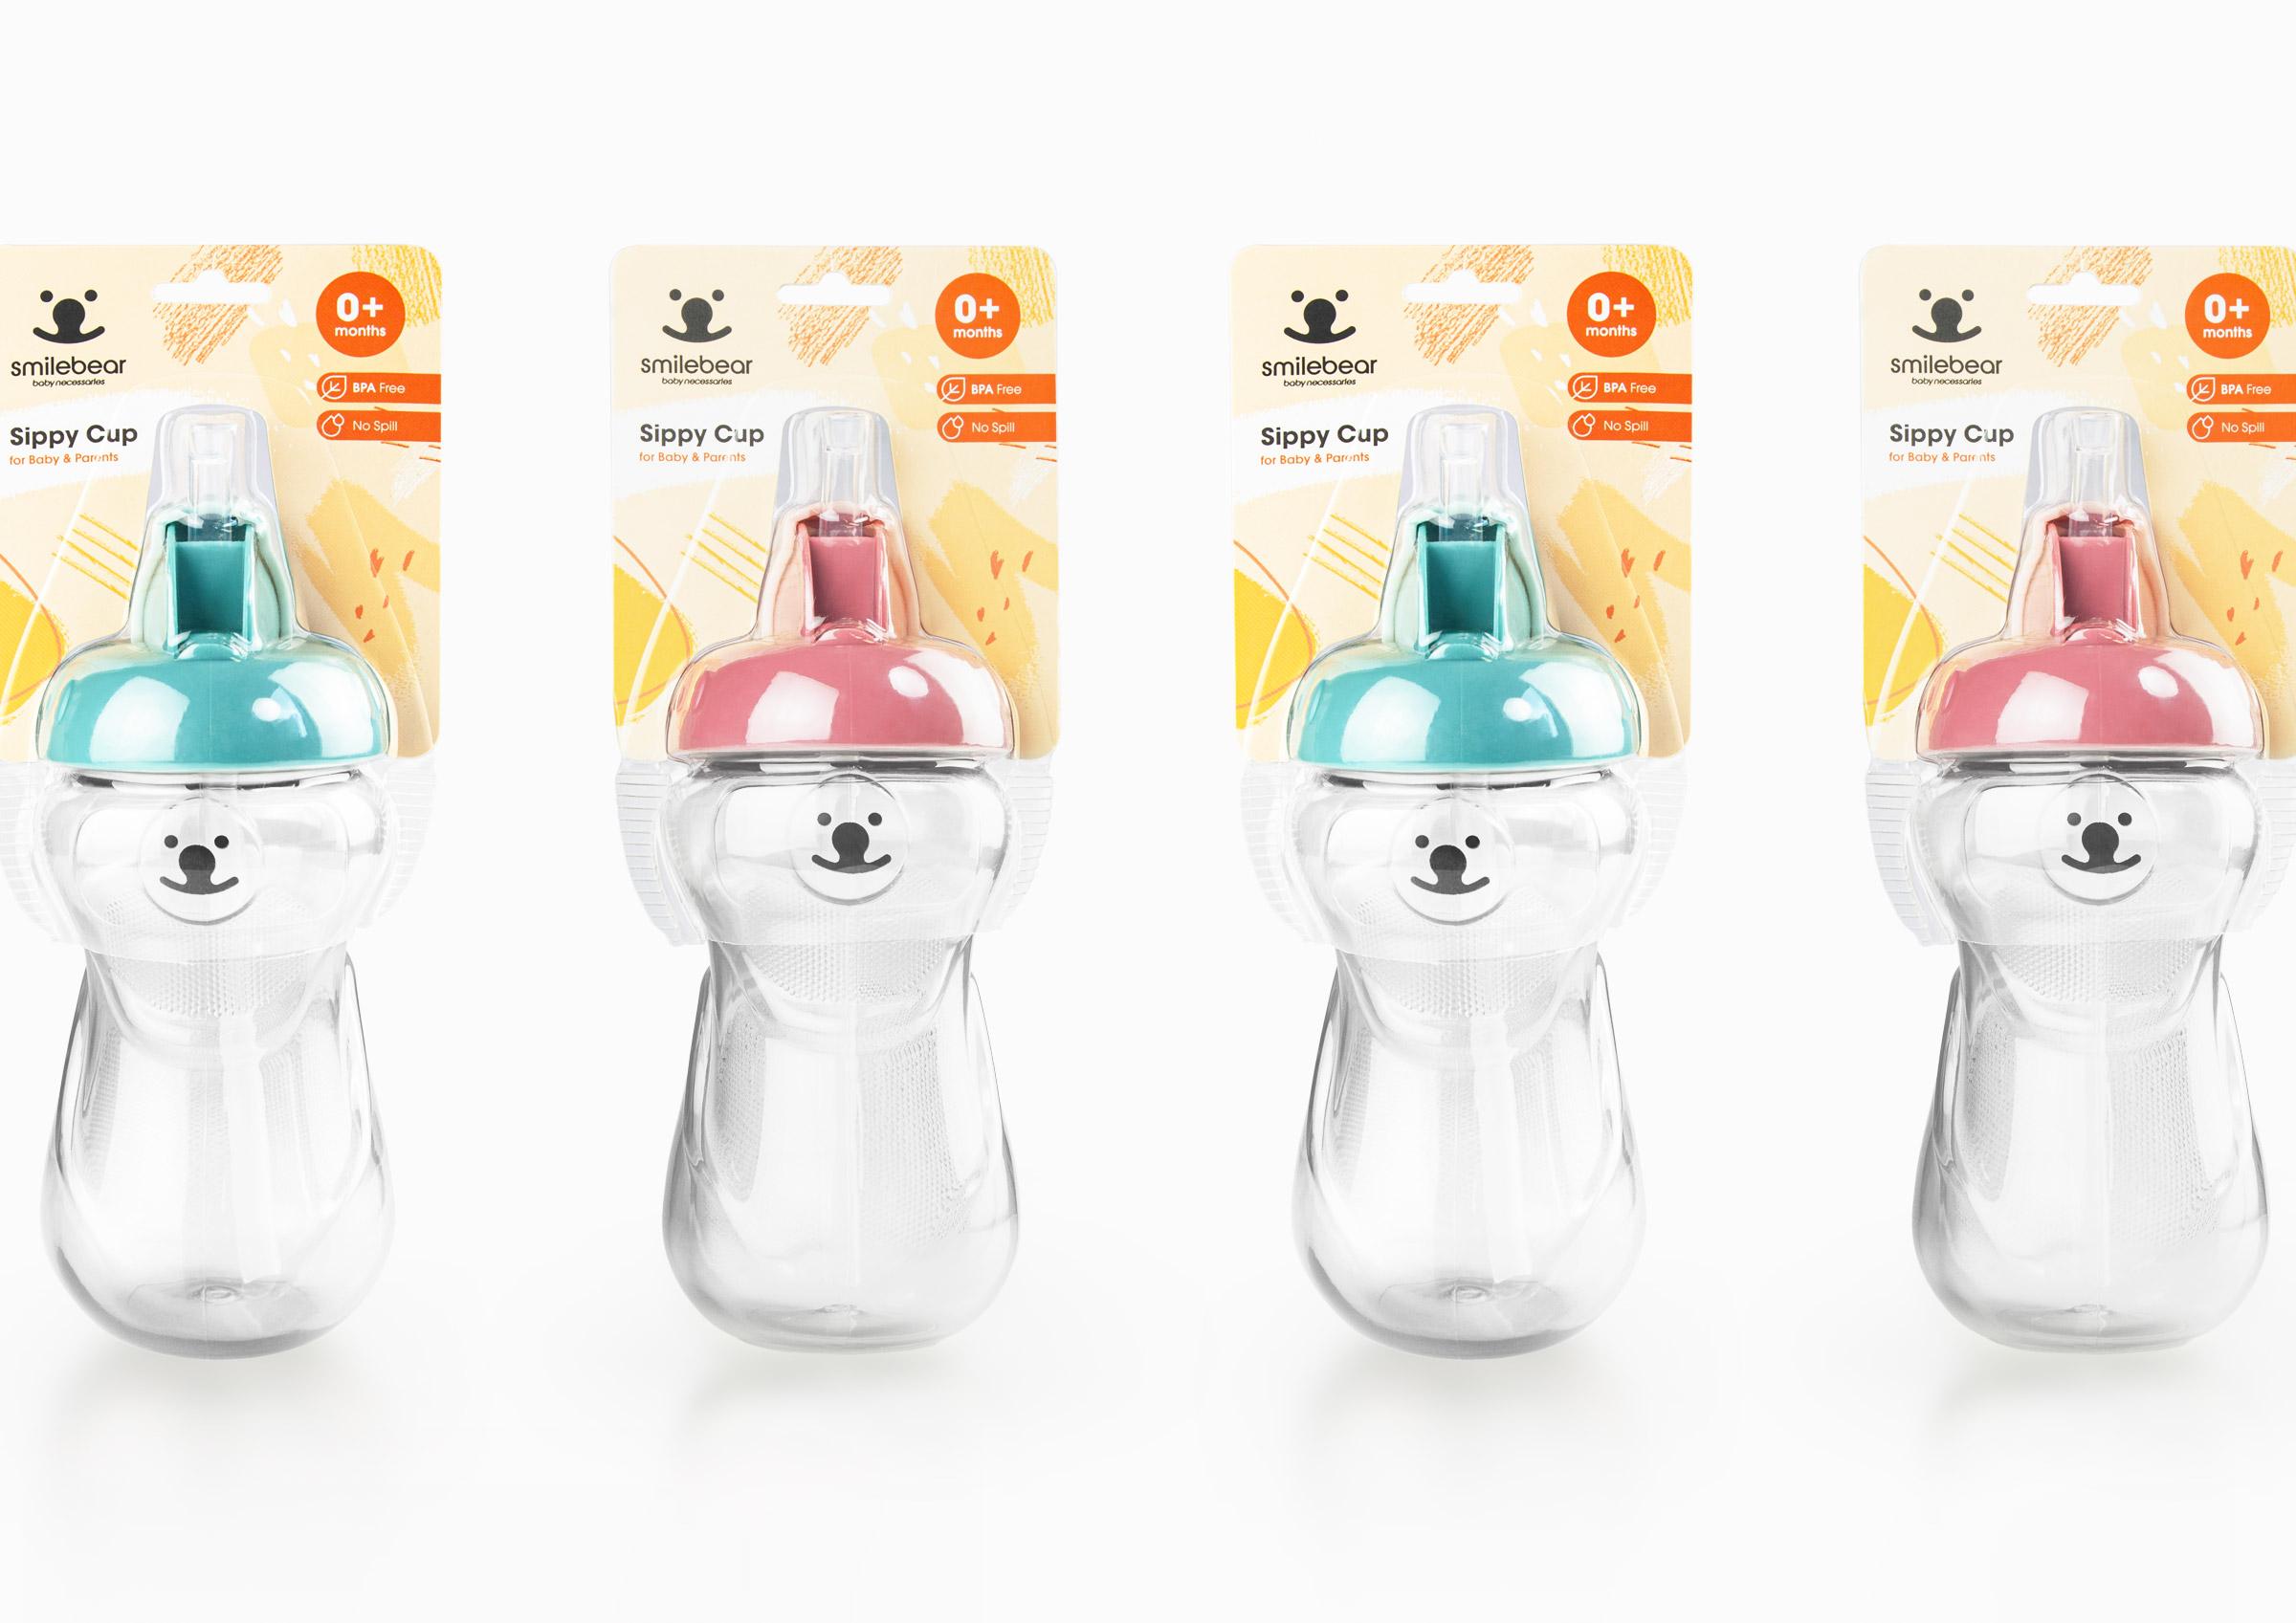 Smilebear Branding Design by Box Brand Design